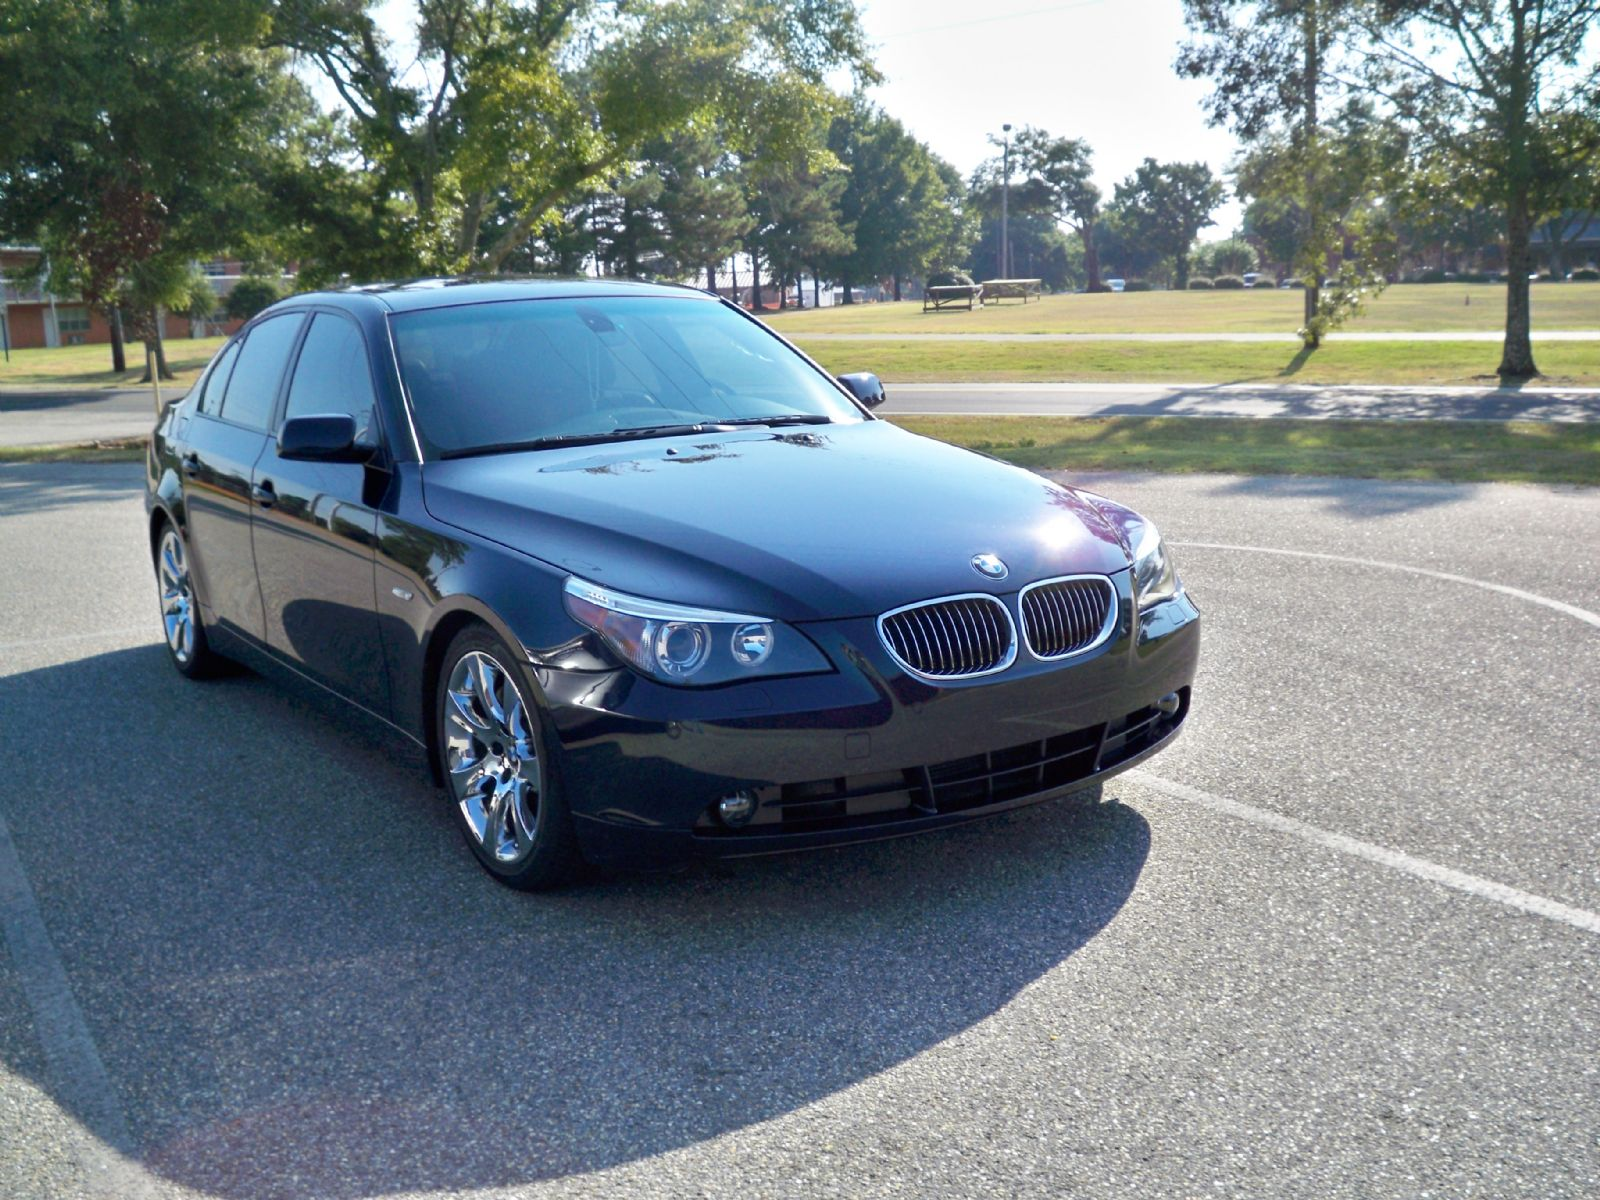 BMW Sports For Sale Fort Rucker Alabama - 545 bmw